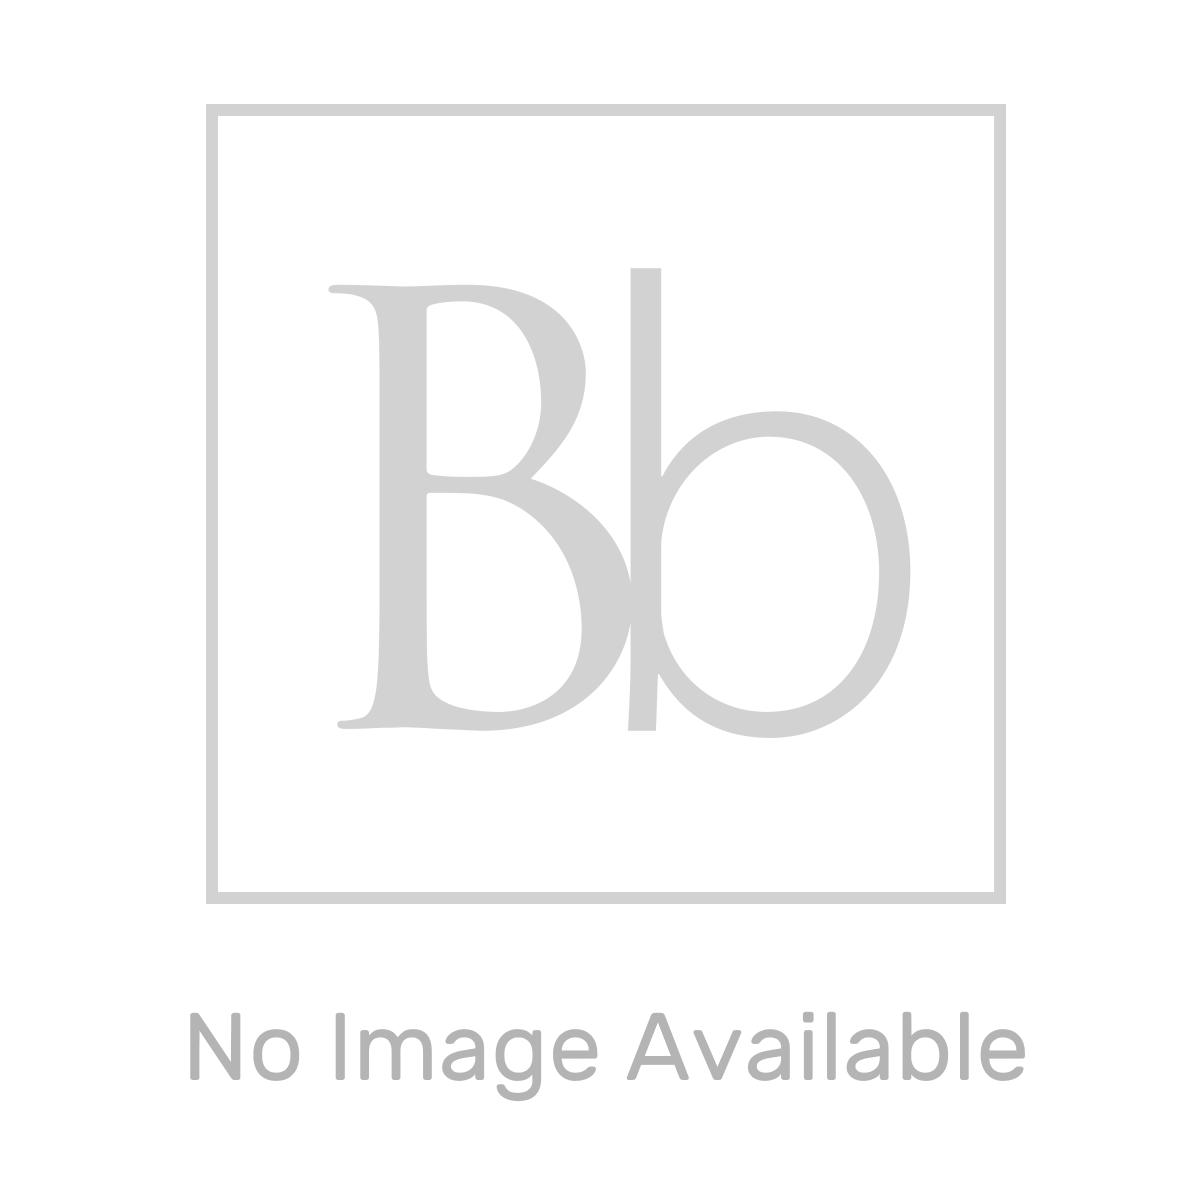 RAK Feeling Chrome Wall Profile 2000mm Measurements